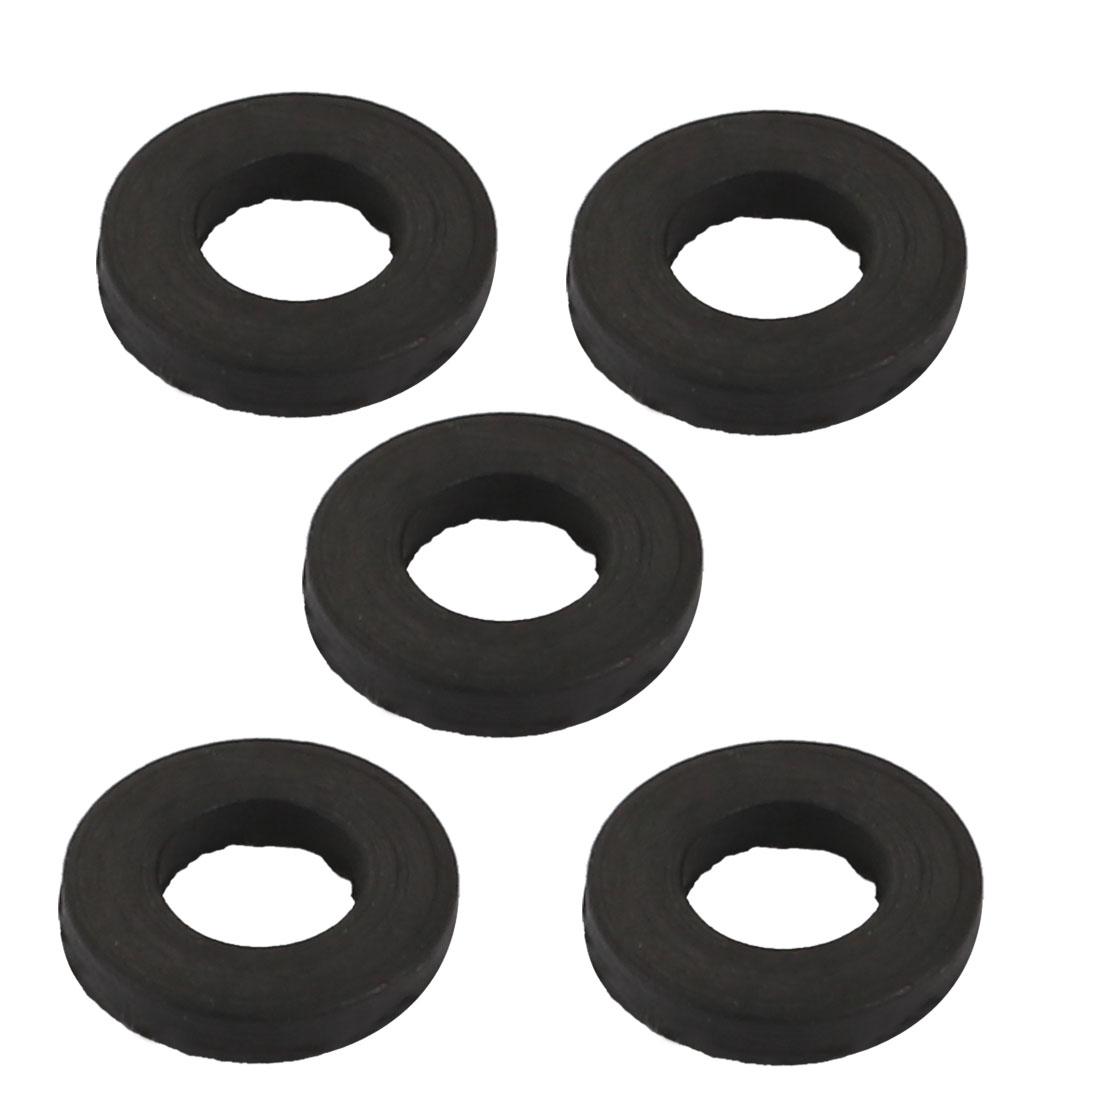 5pcs Black Rubber Round Flat Washer Assortment Size 5x9x1.5mm Flat Washer